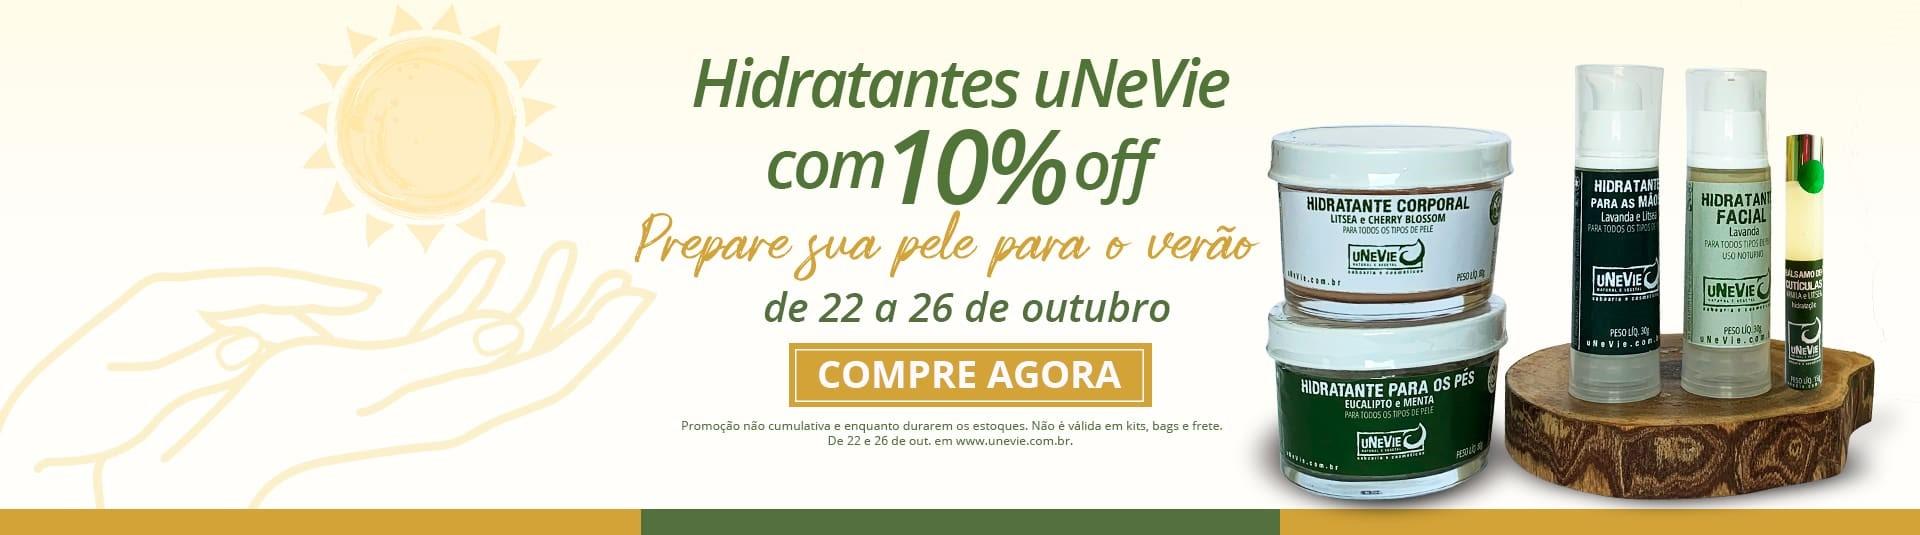 LR 2020-10-22 hidratantes 10% off